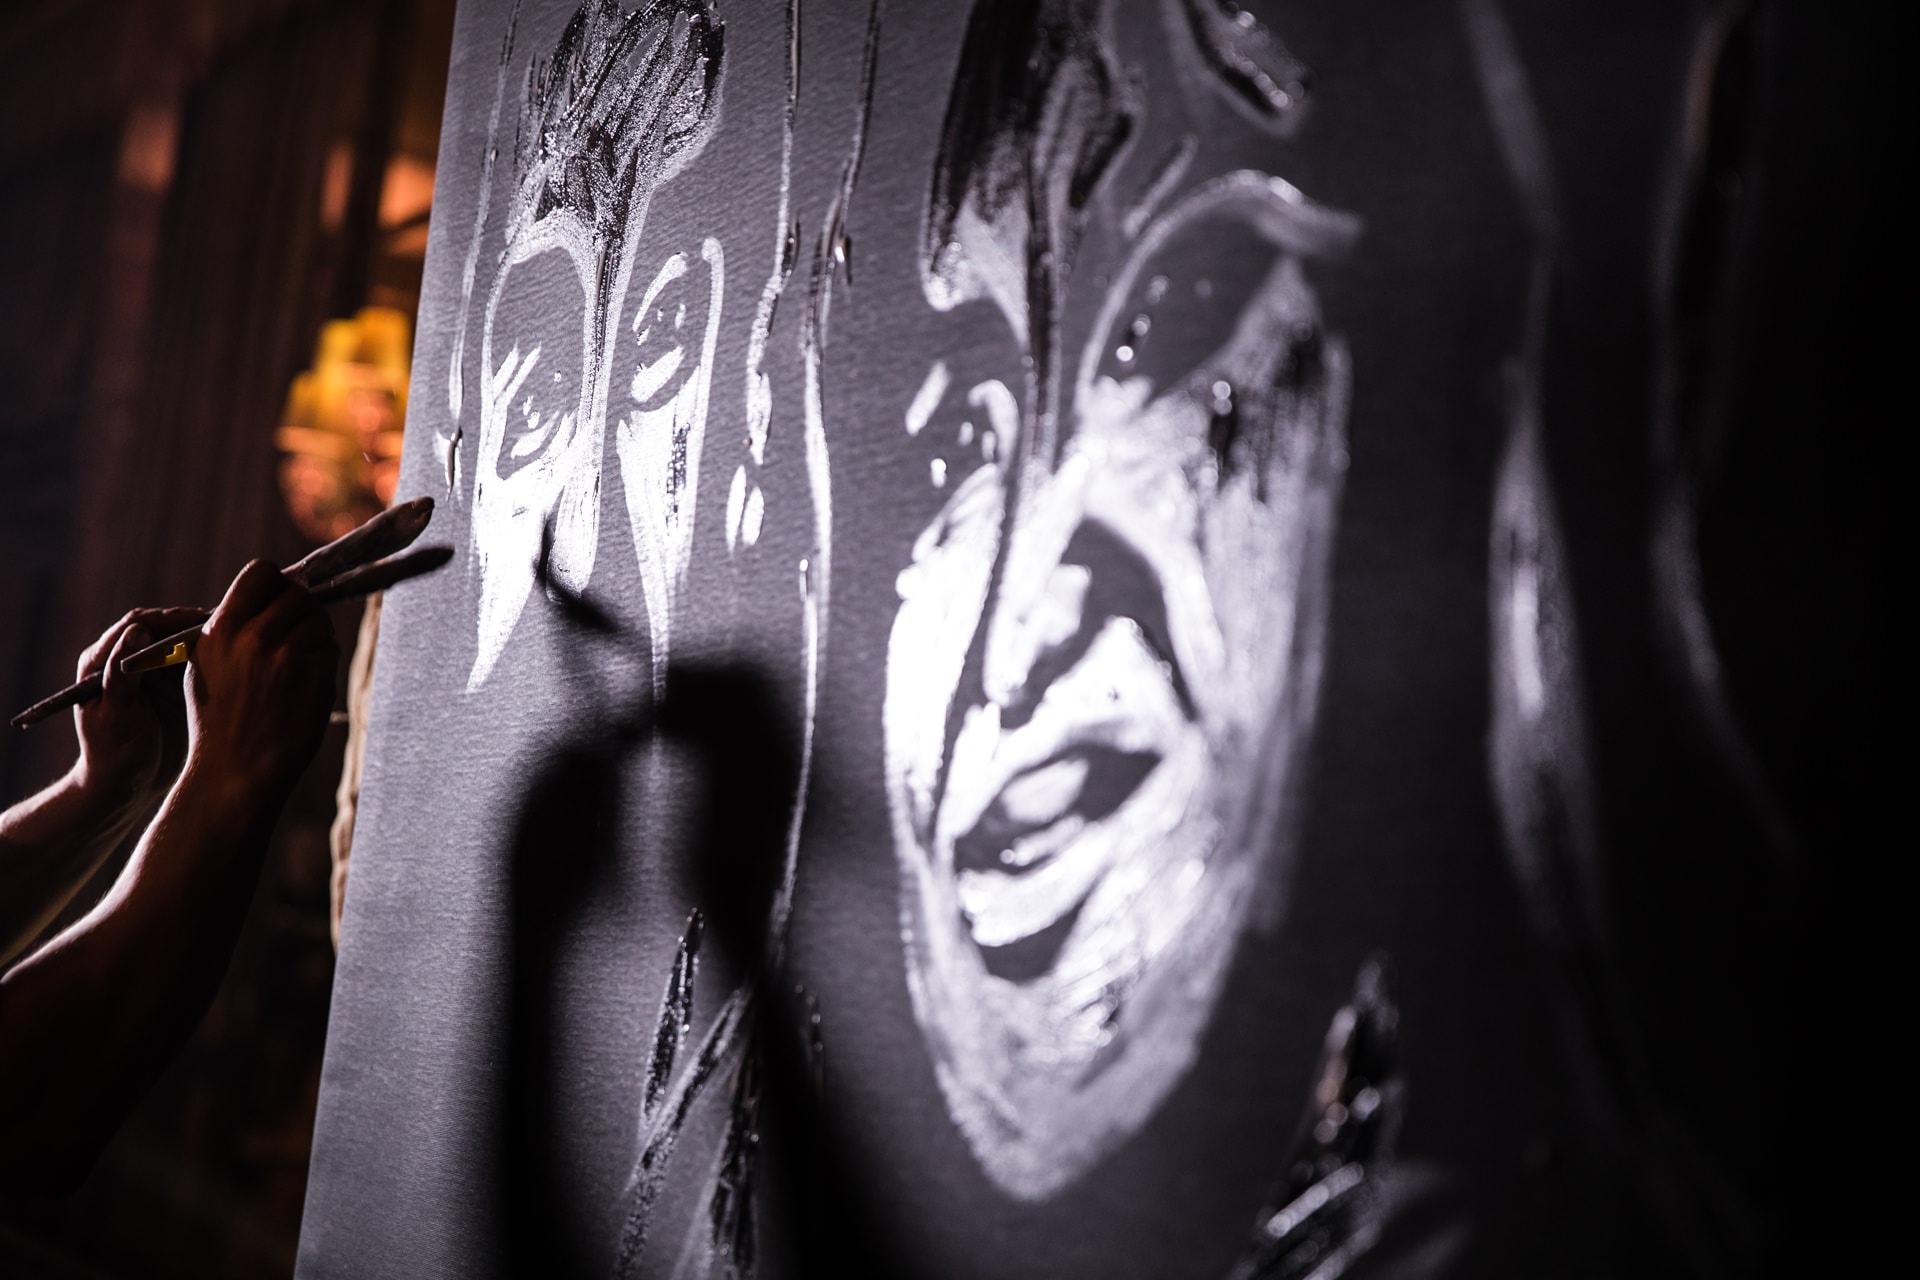 Dave Sharpe Glitter artist